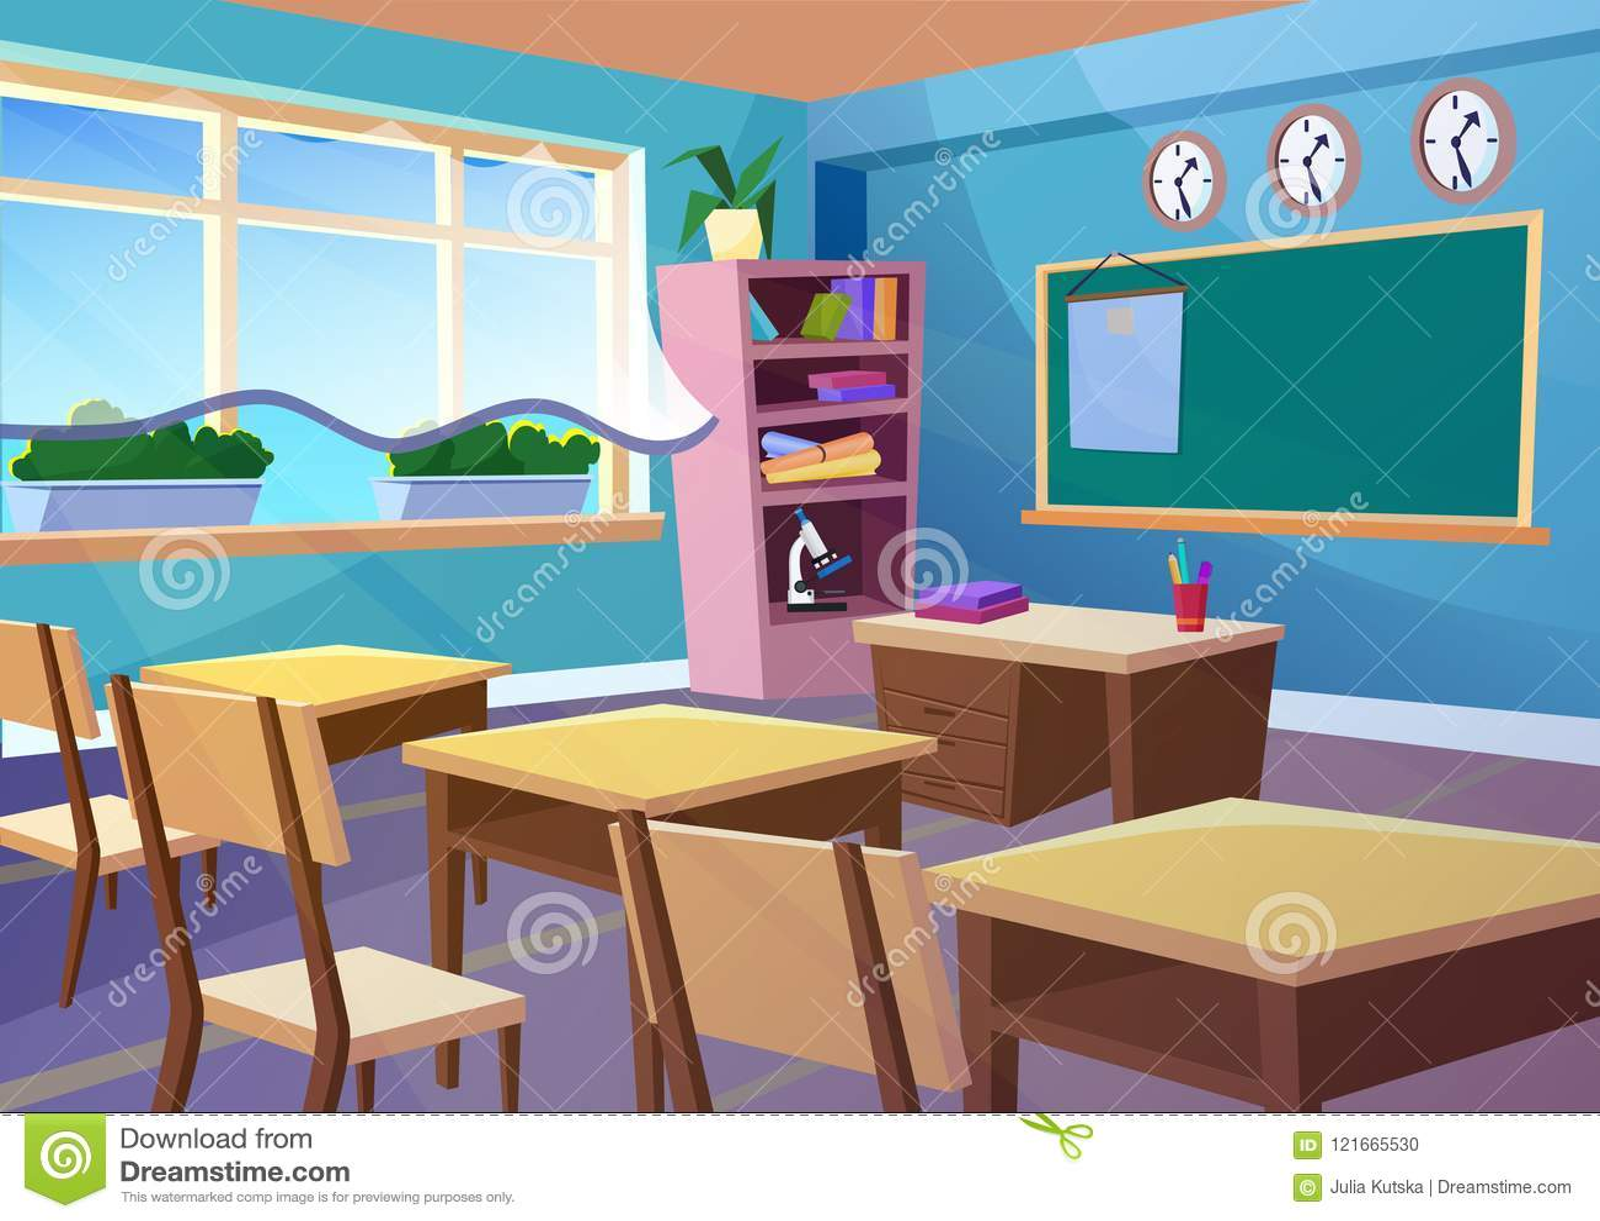 Modern gradient flat vector illustration of cartoon empty school